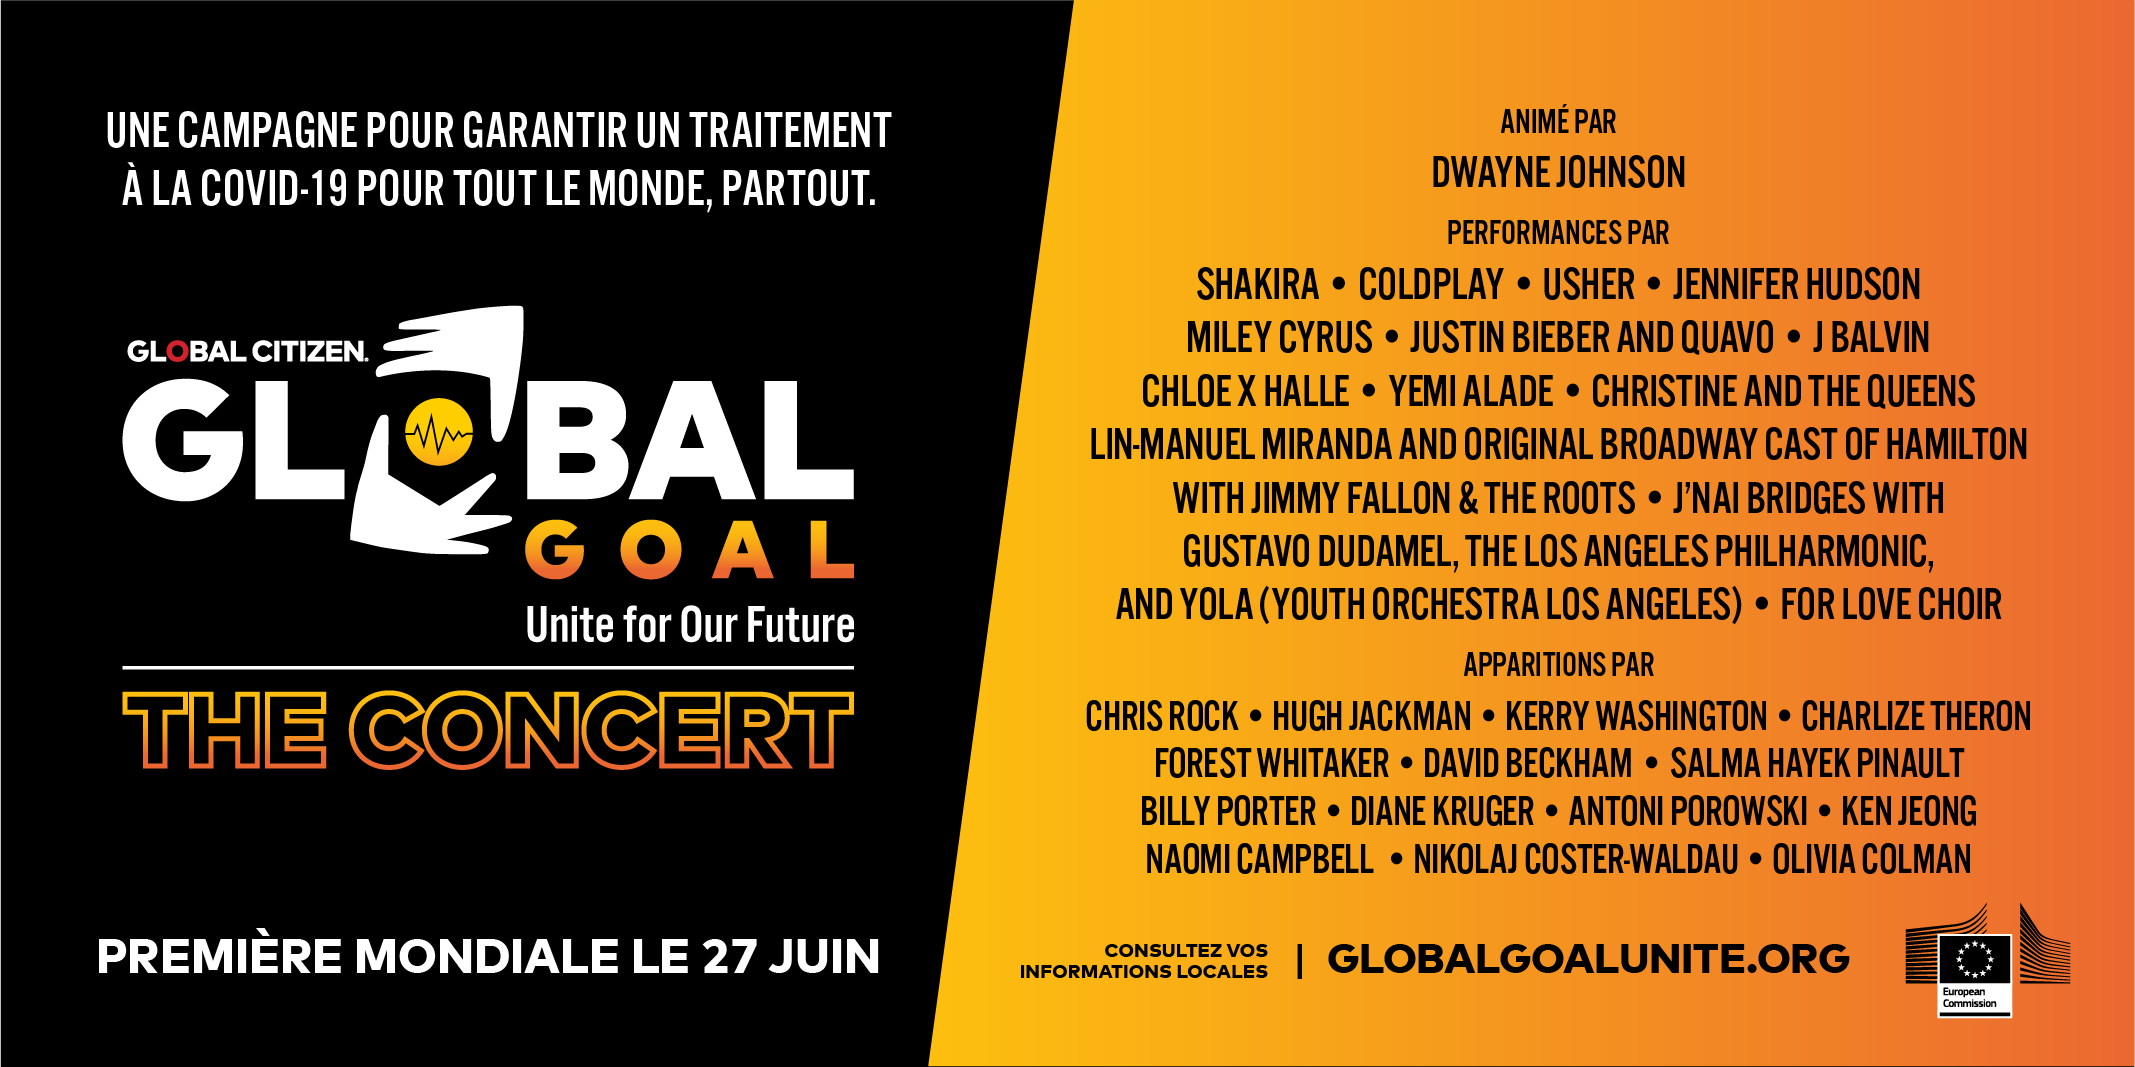 GGUFOF_concert_admat_FR_2_concert_email_twitter.png